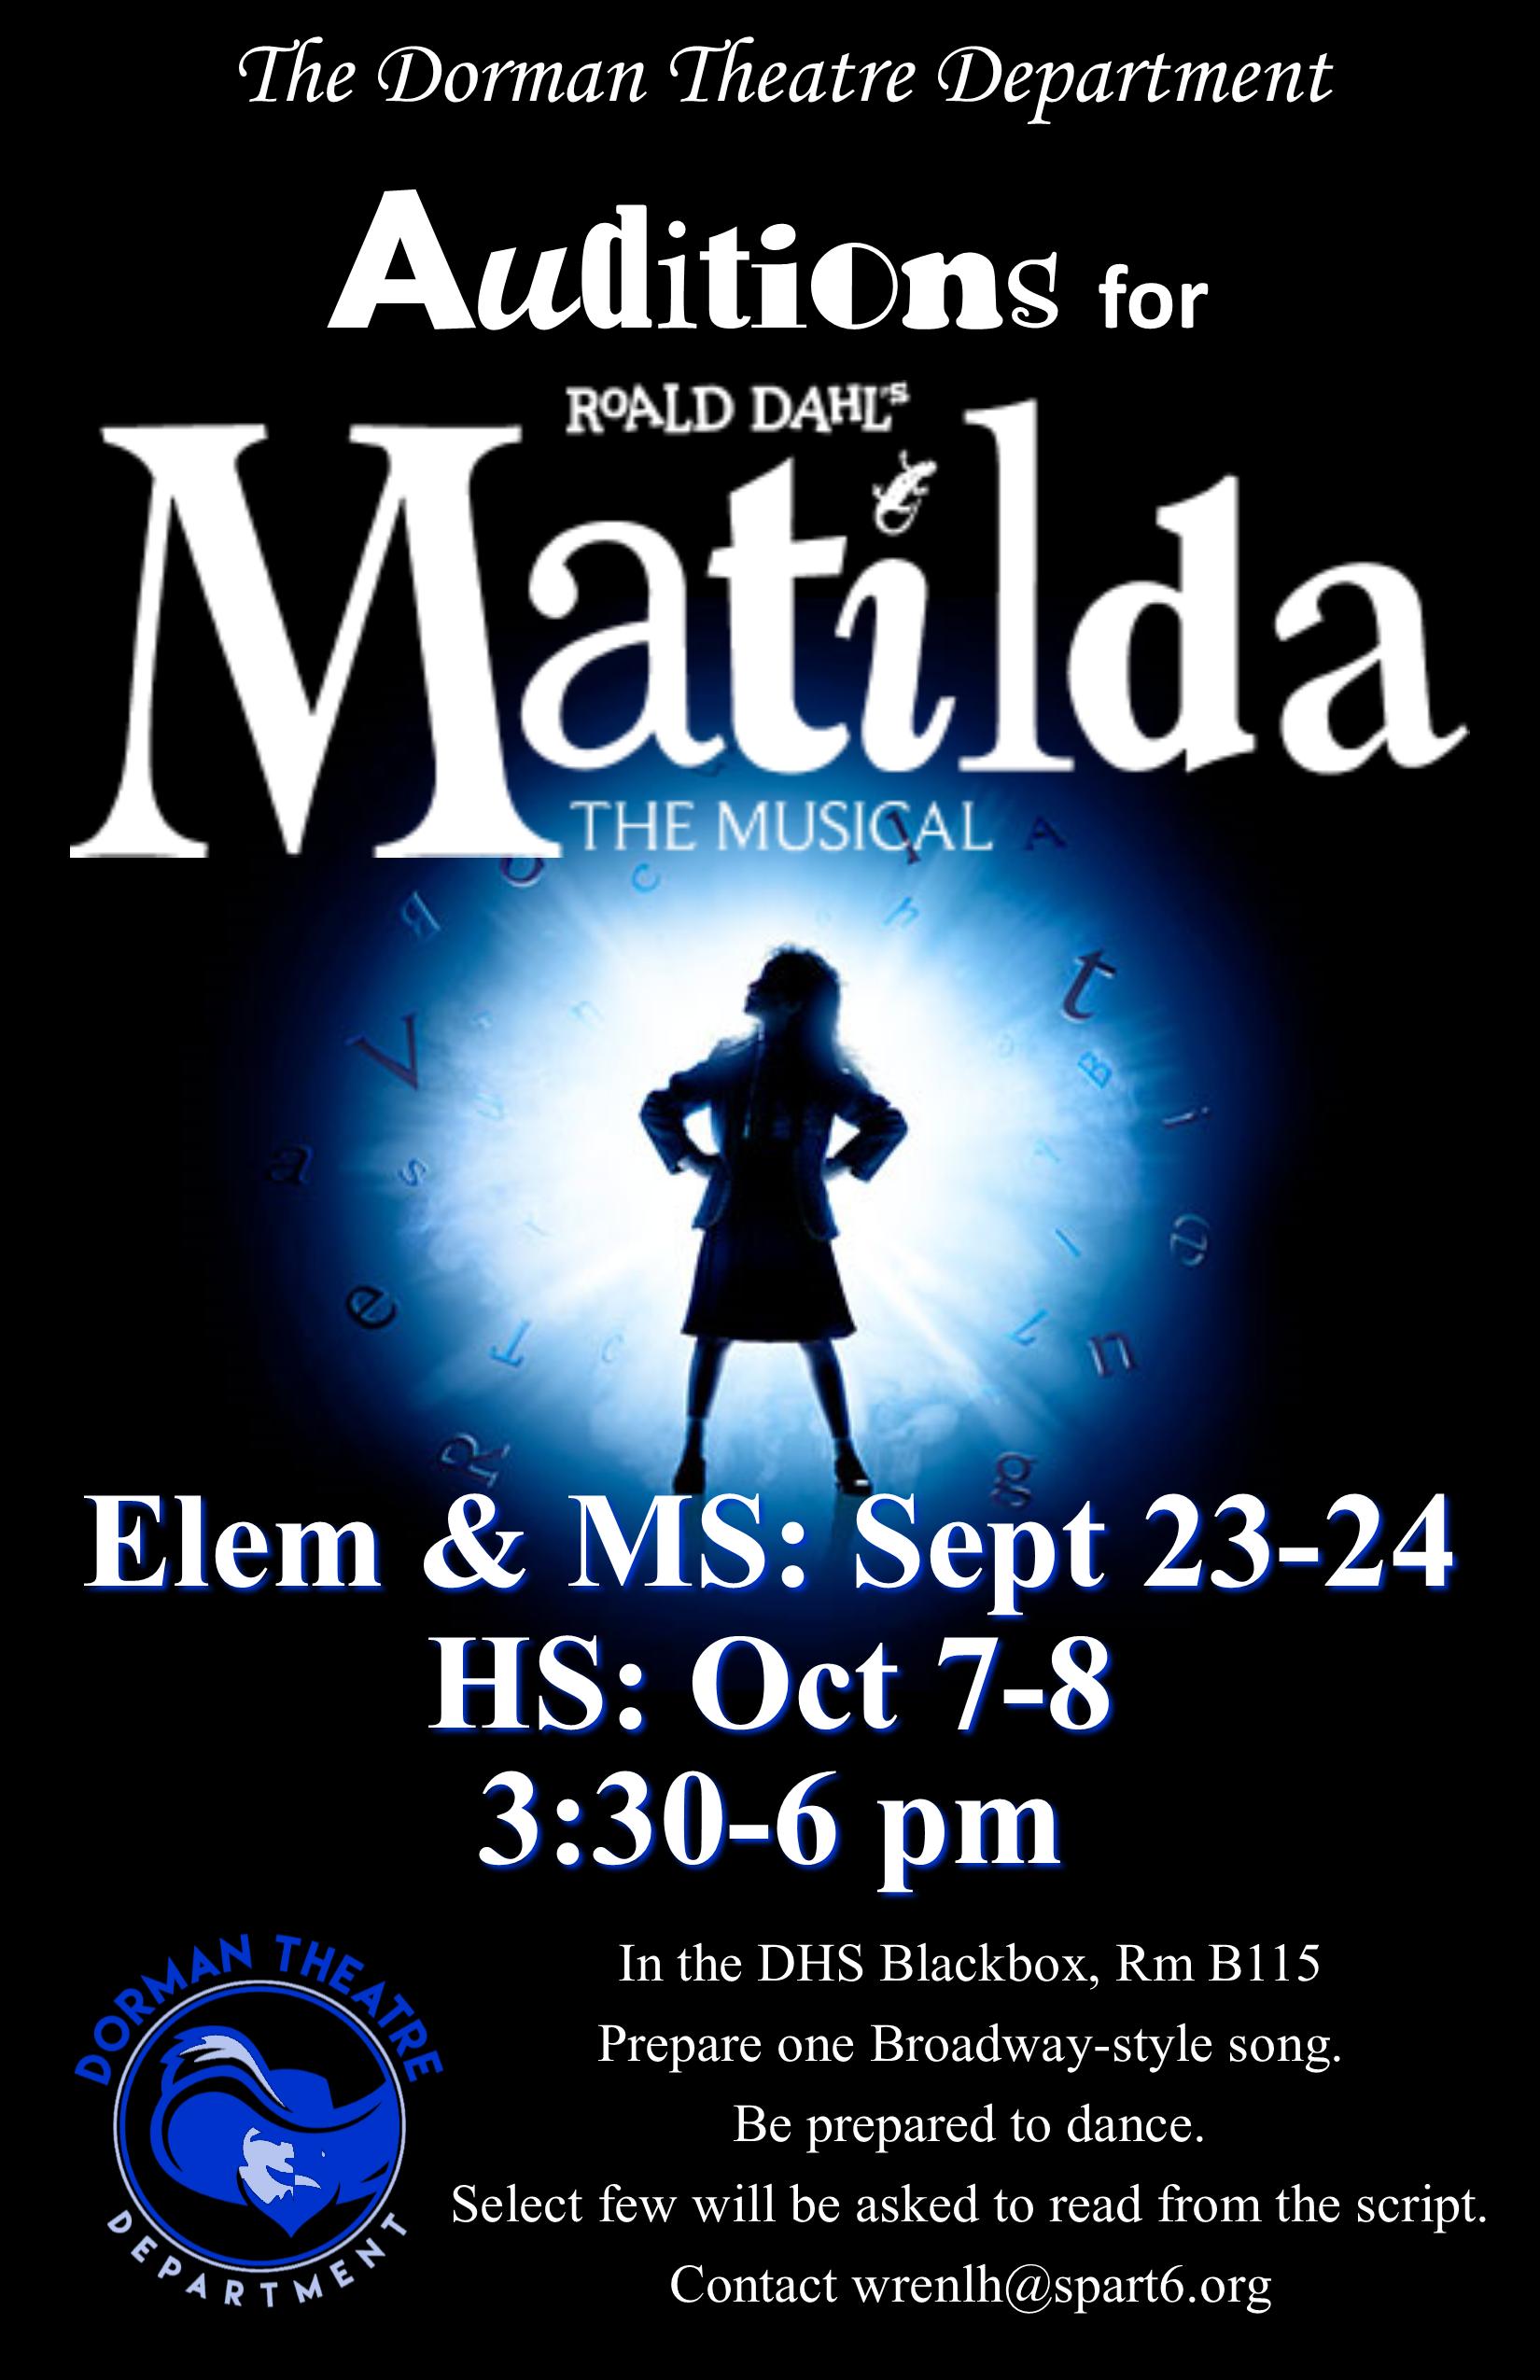 Matilda audition poster